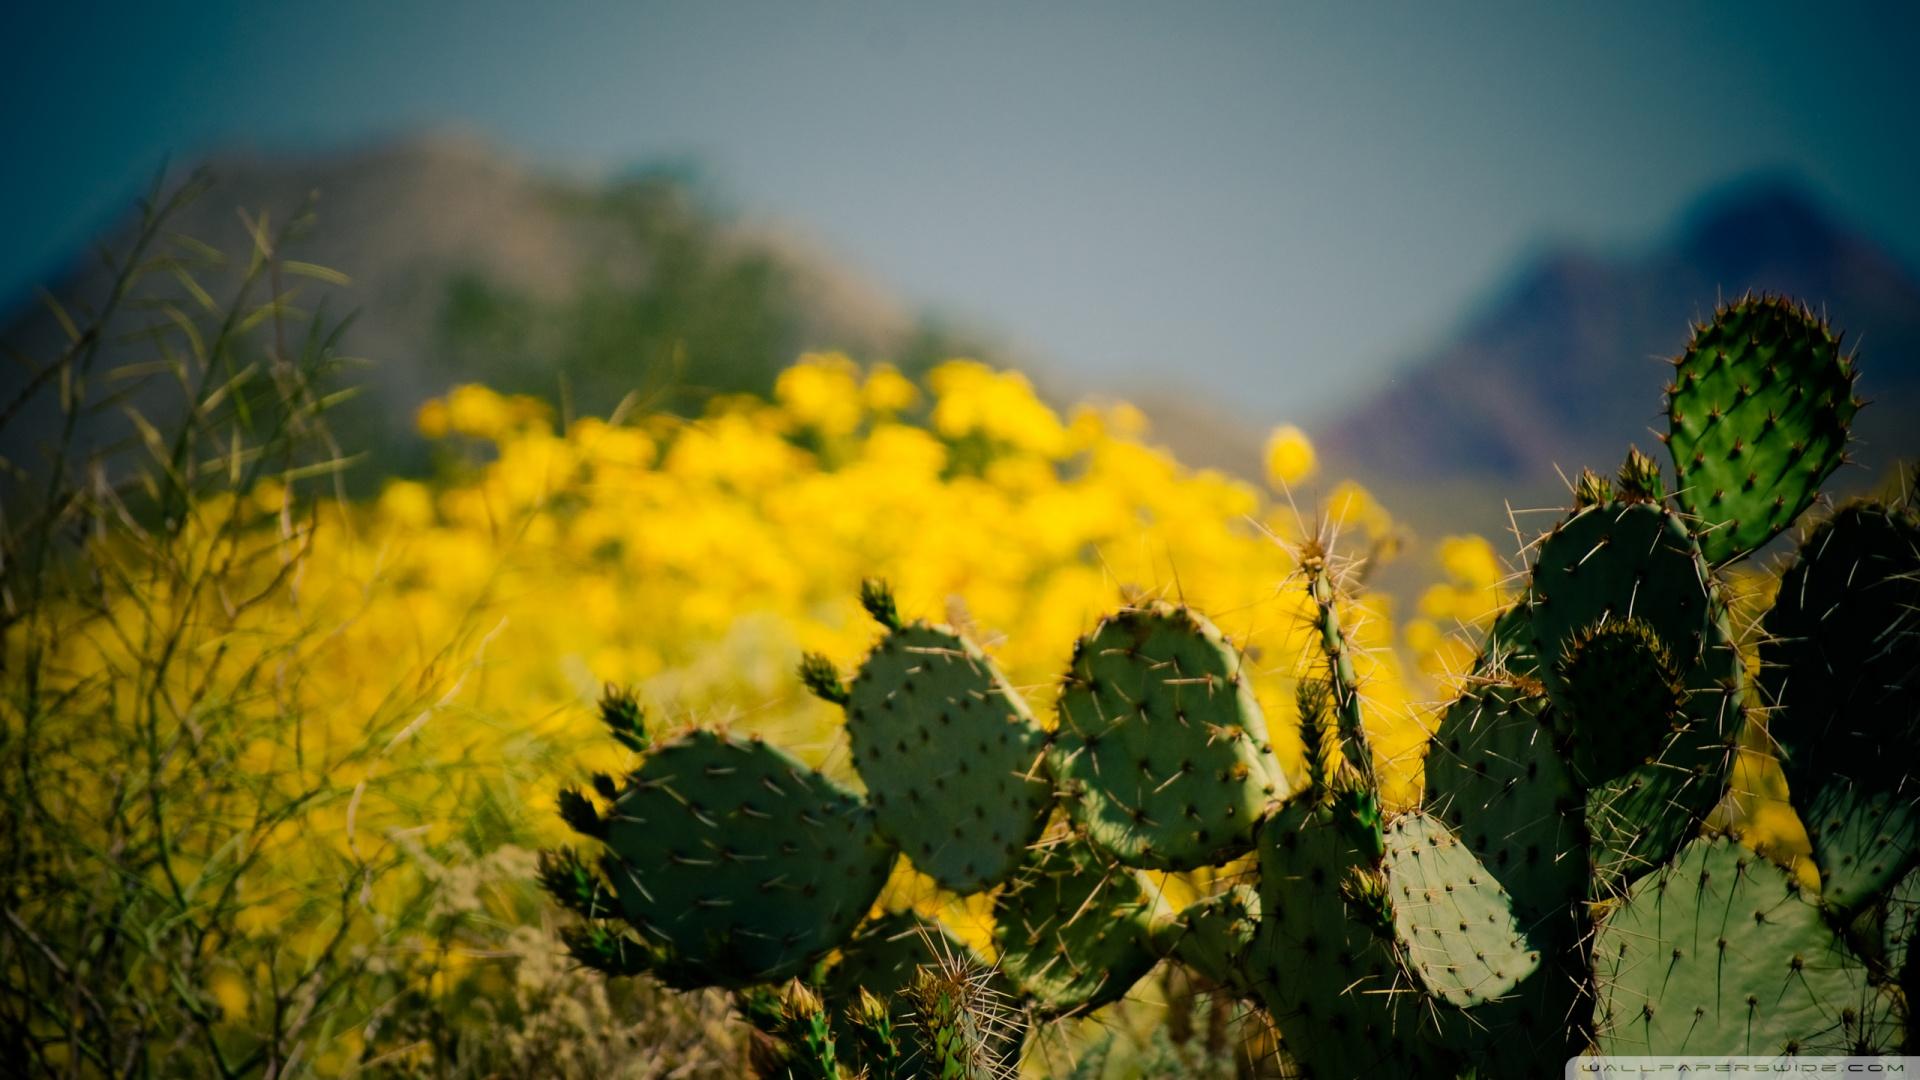 Cactus Taliesin West Scottsdale Arizona Wallpaper 1920x1080 Cactus 1920x1080